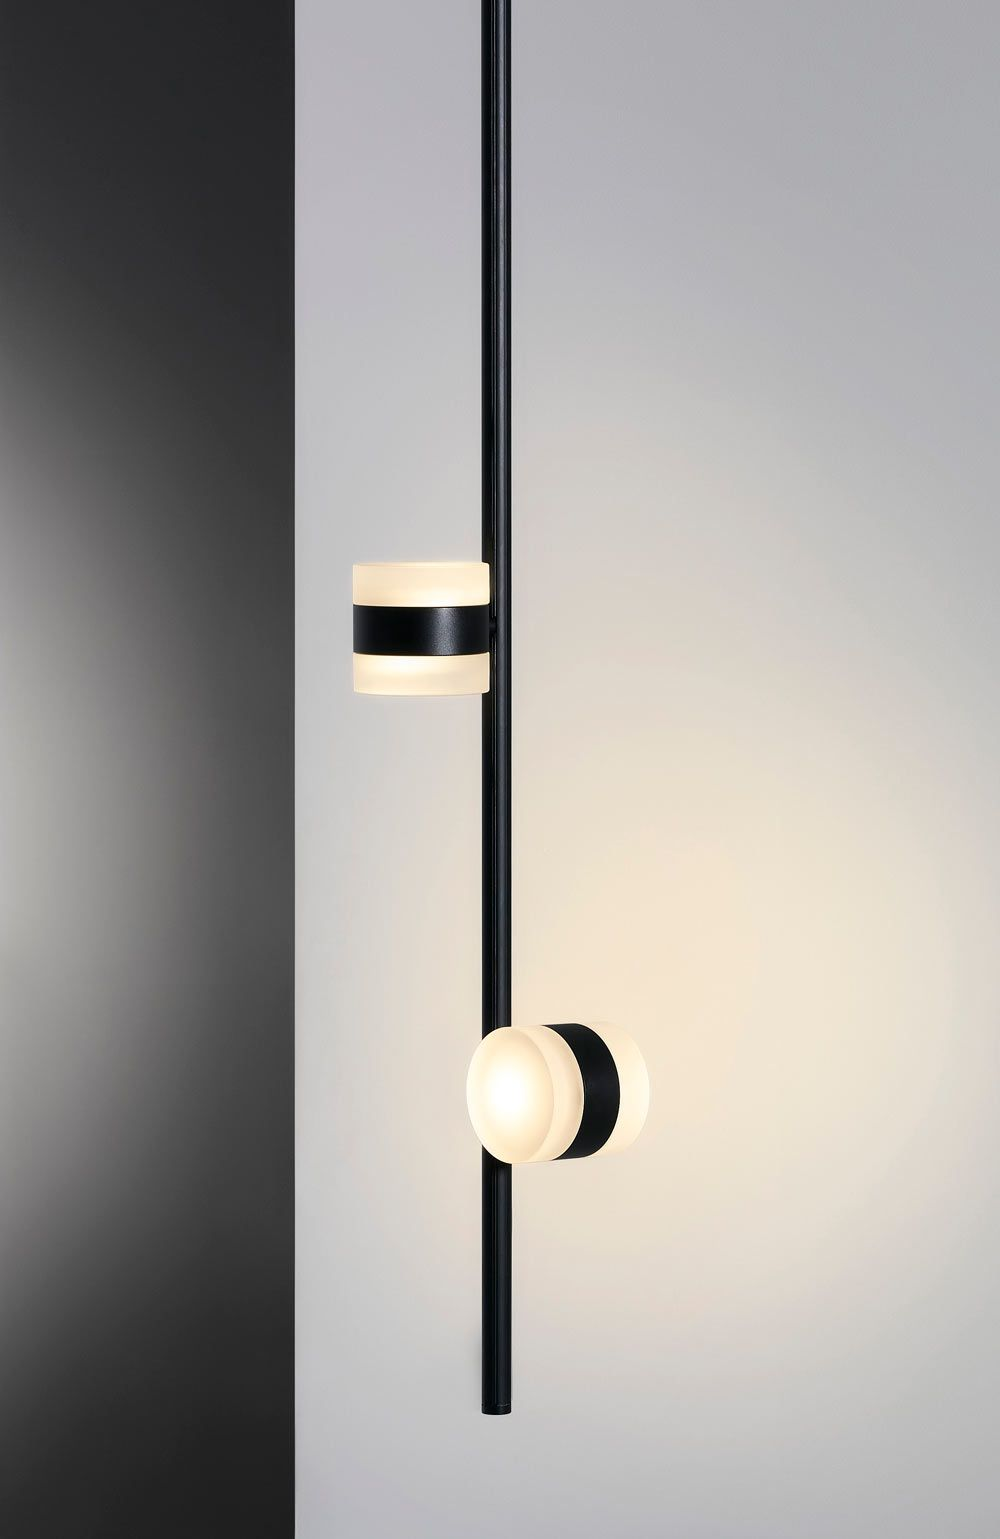 Studio Truly Truly Designs Mix Match Lighting System For Rakumba